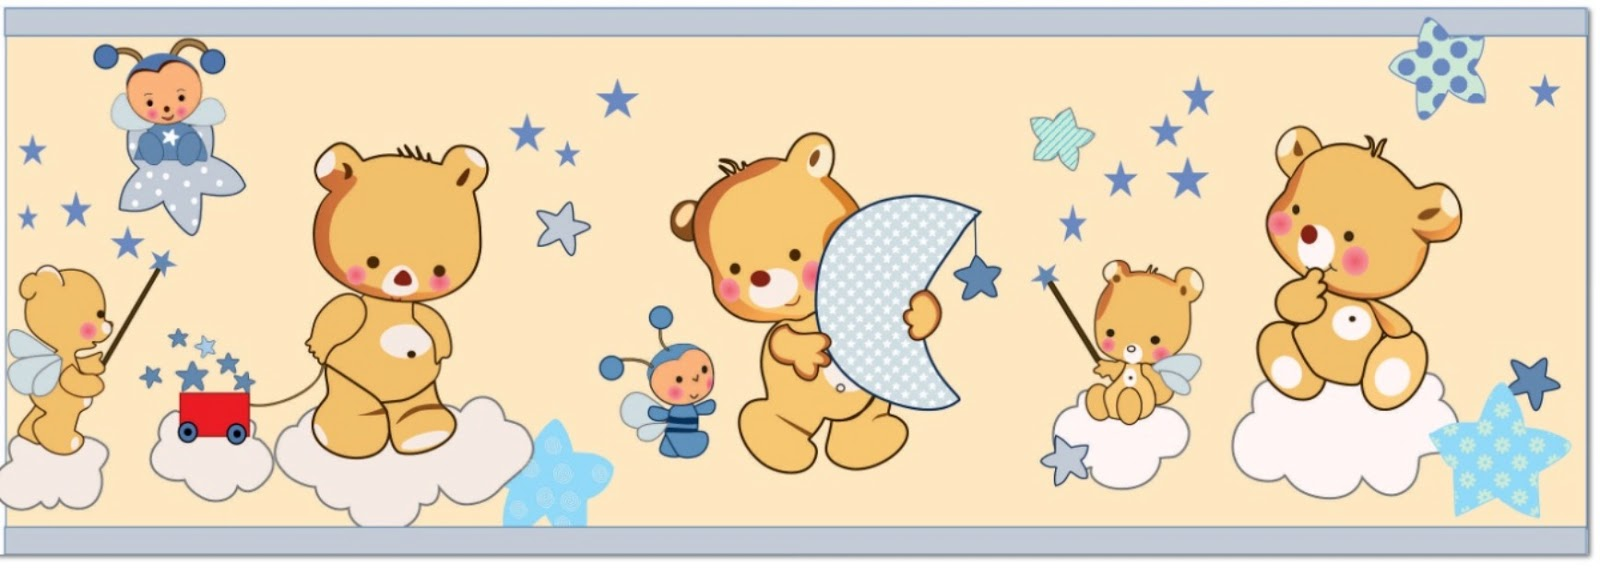 Sgblogosfera mar a jos arg eso cenefas para beb s - Cenefas decorativas infantiles ...